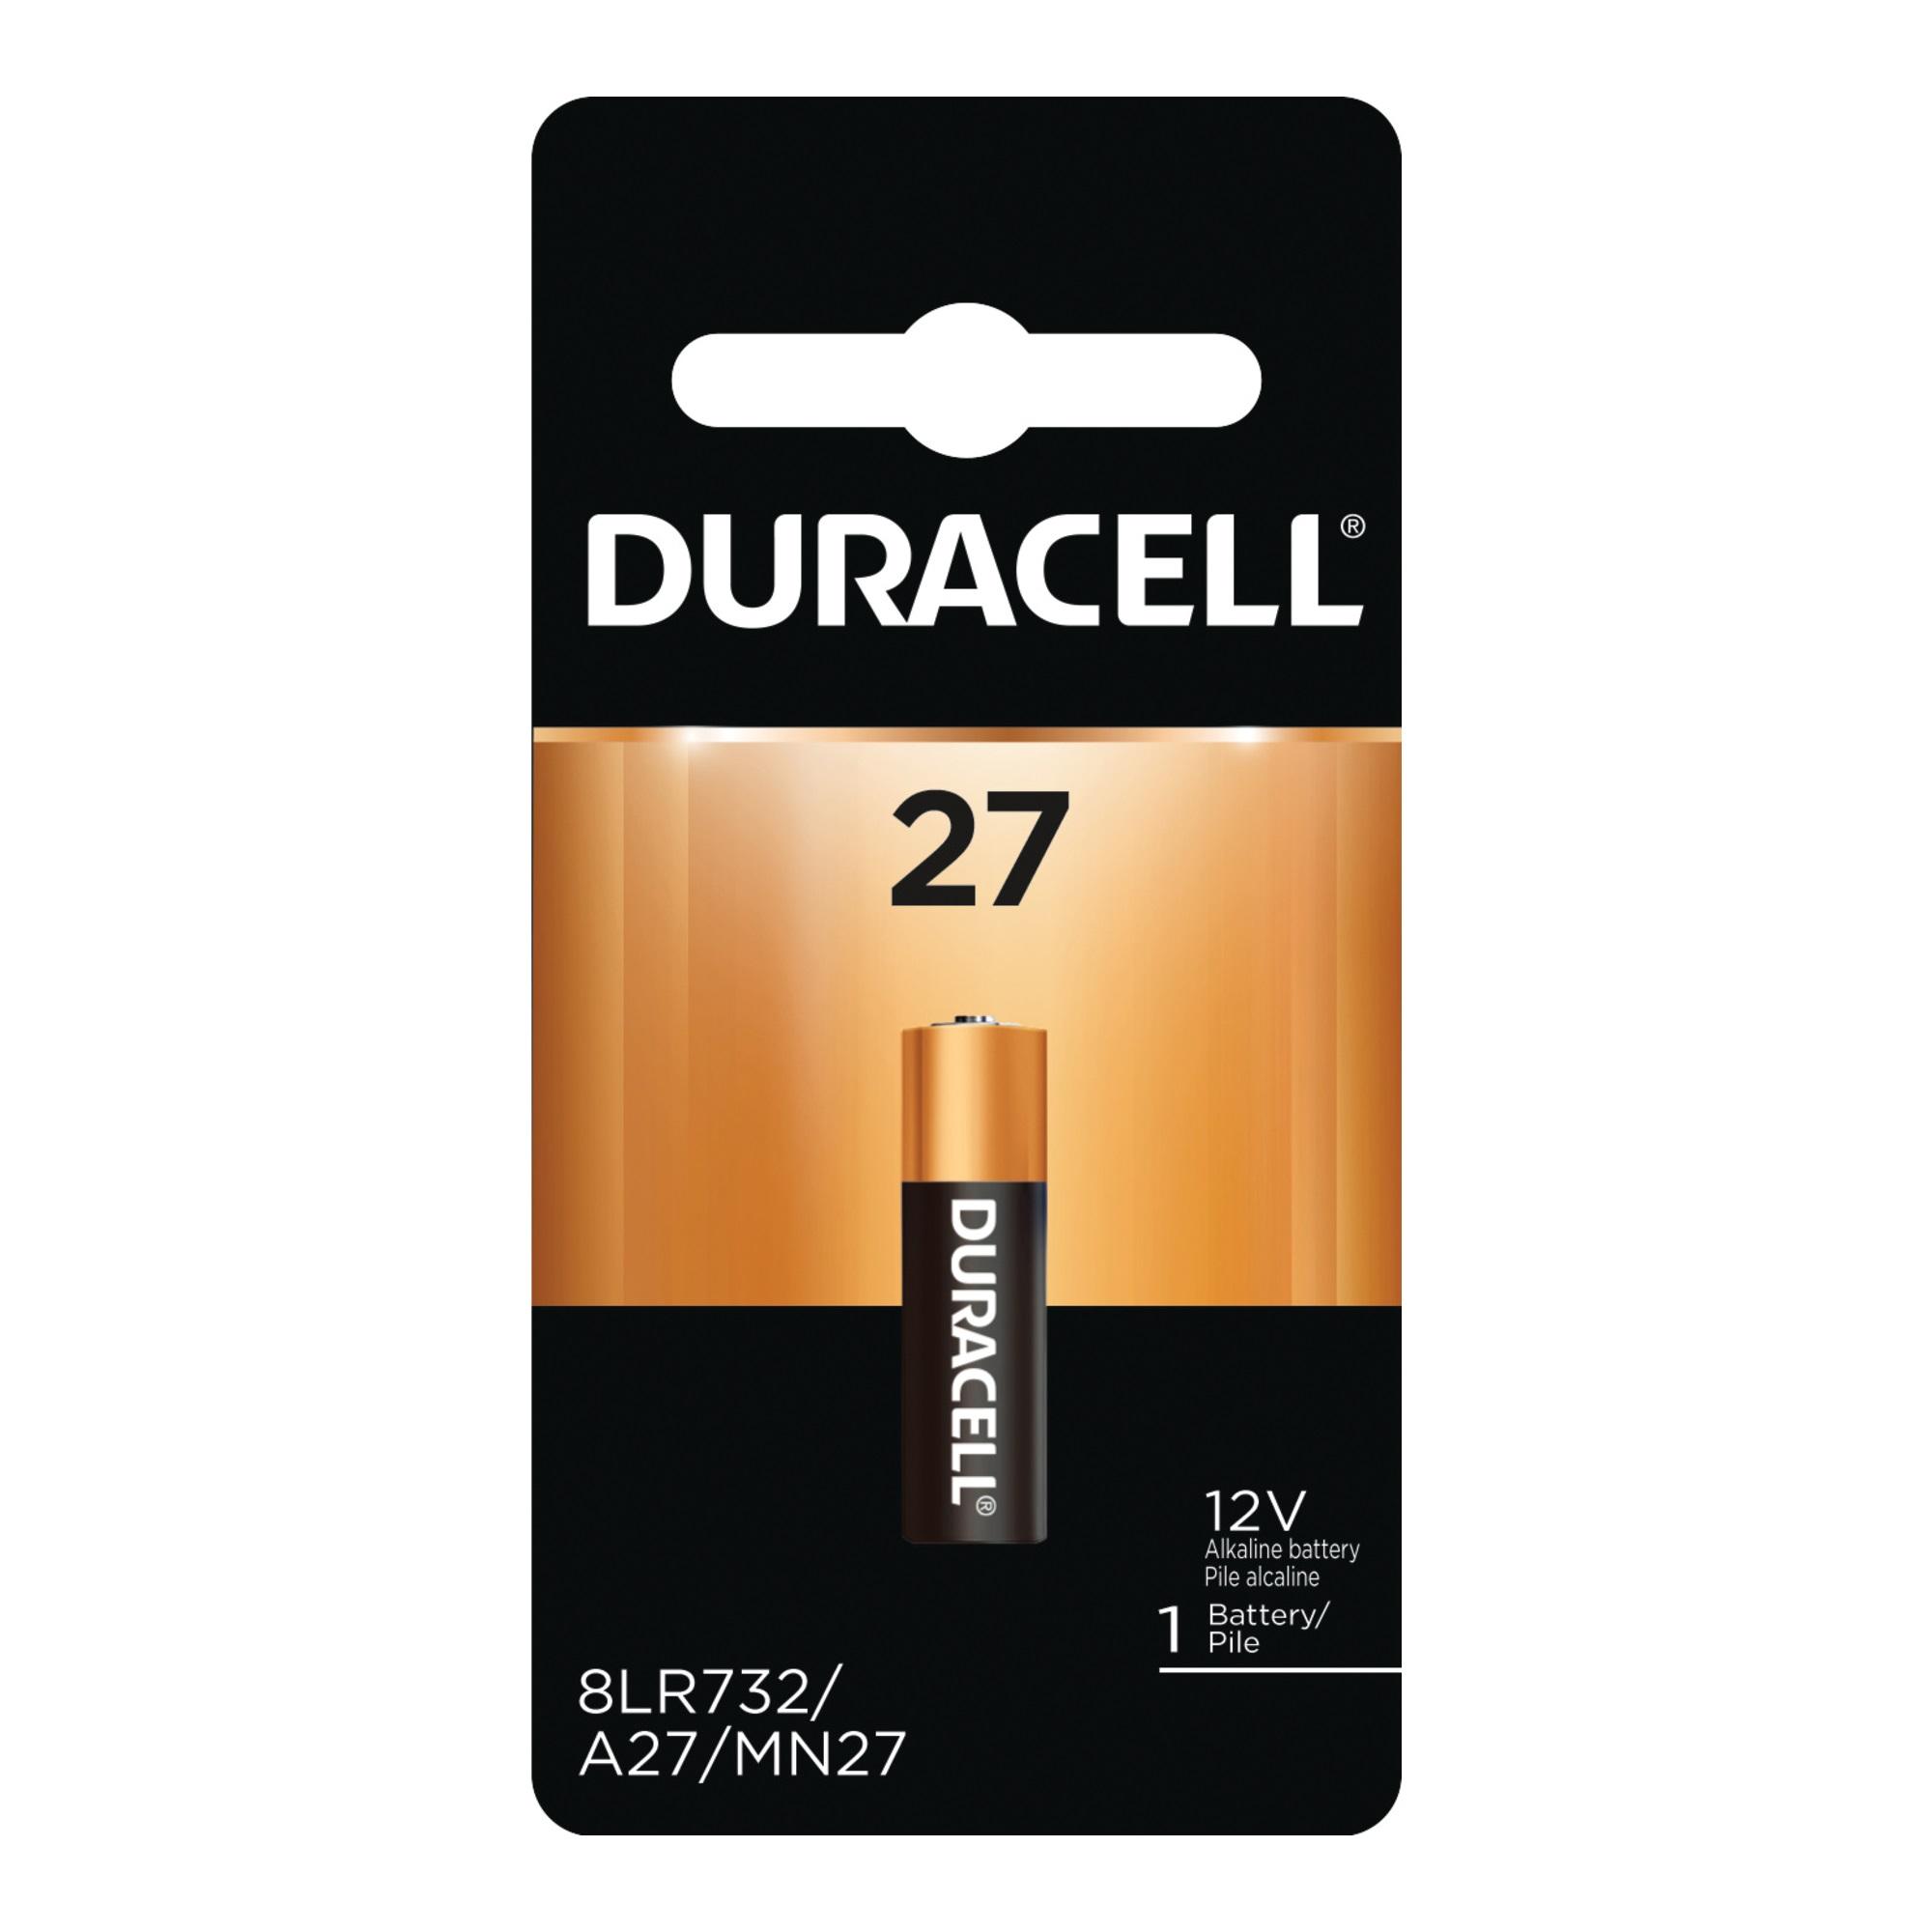 Picture of DURACELL MN27BPK DURACELL MN27 Battery, 12 V Battery, 20 mAh, MN27 Battery, Alkaline